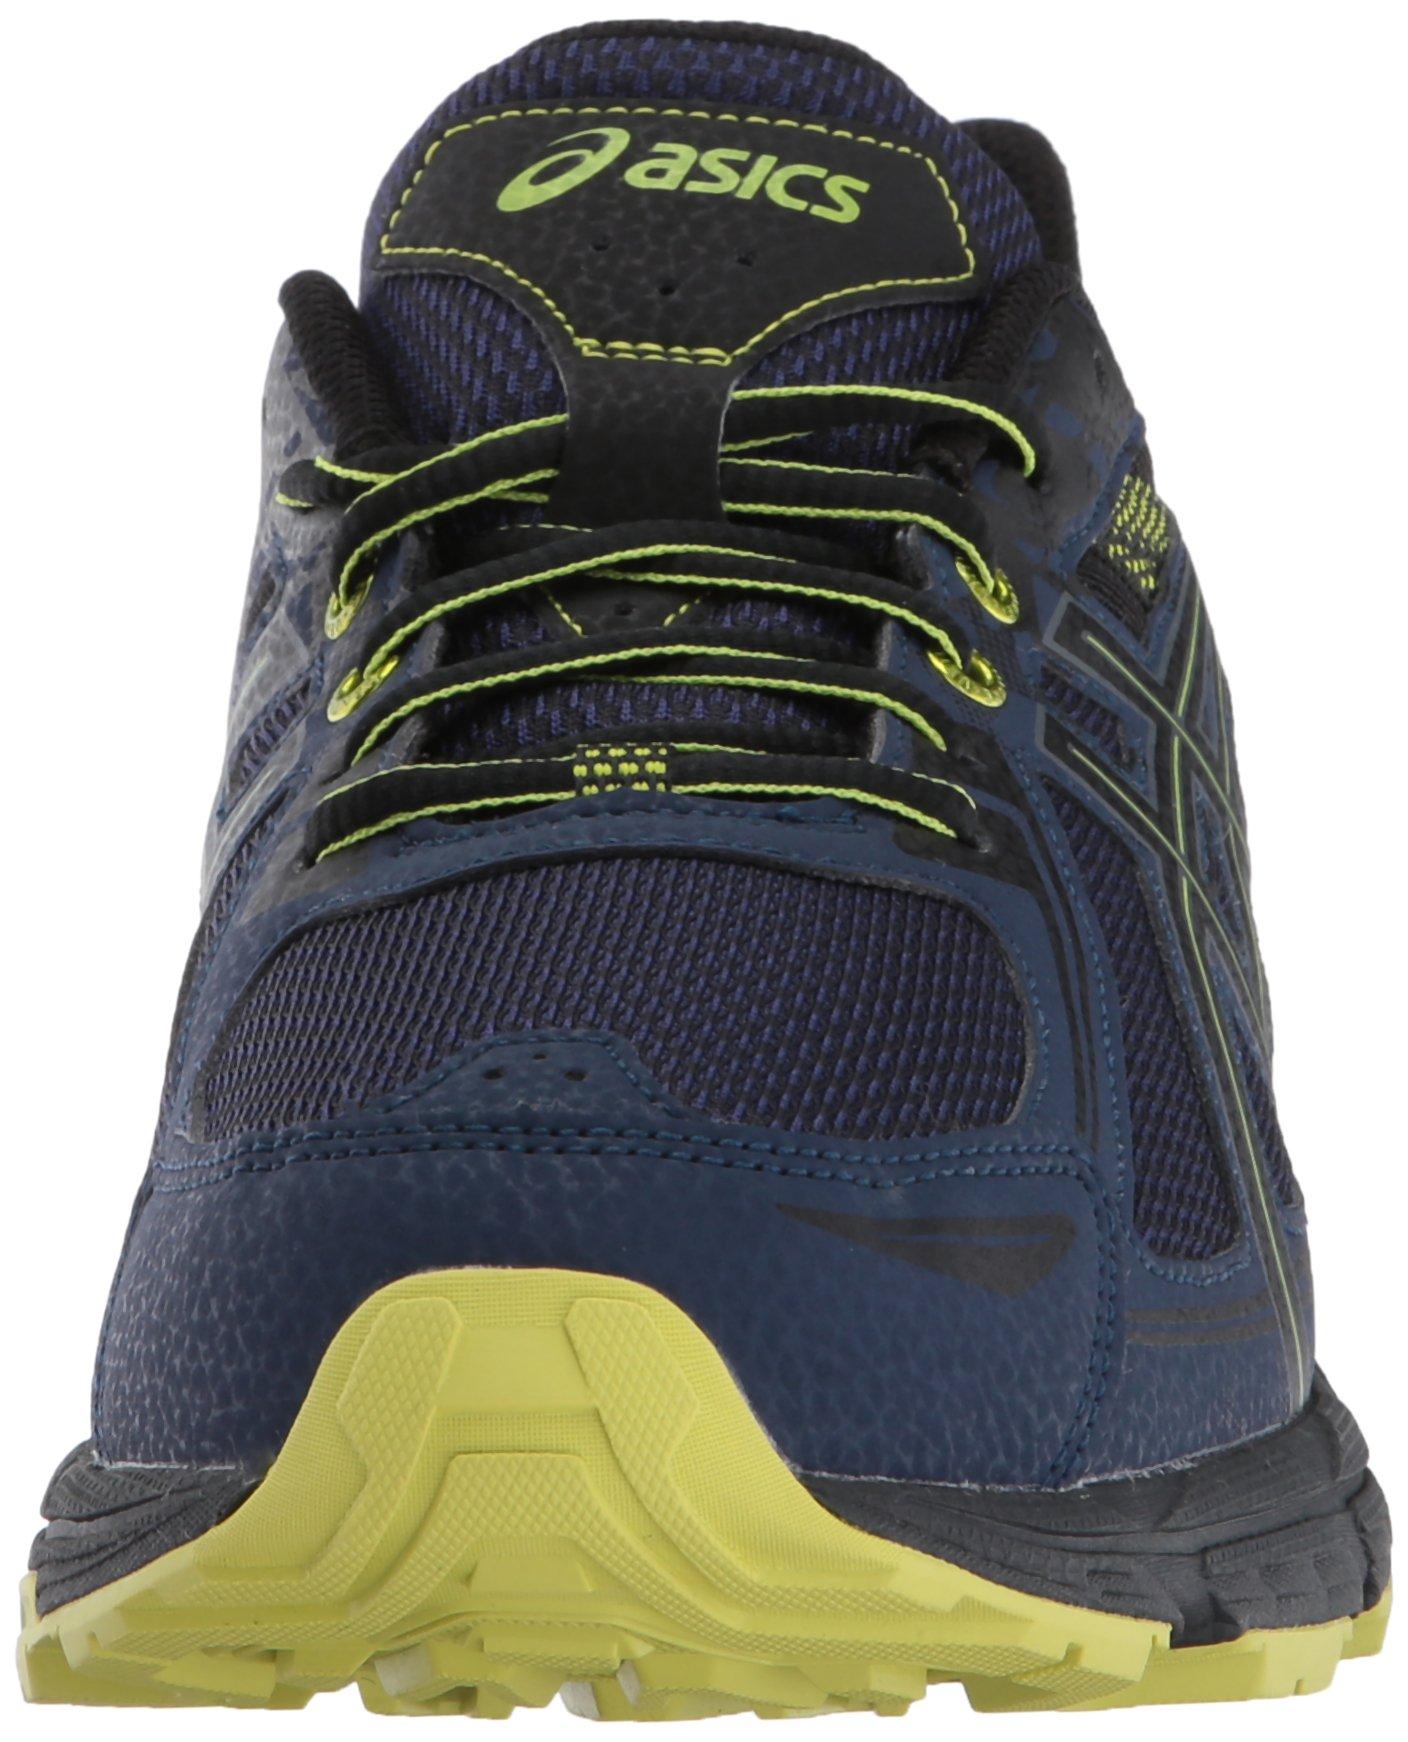 ASICS Mens Gel-Venture 6 Running Shoe, Indigo Blue/Black/Energy Green, 7 Medium US by ASICS (Image #4)